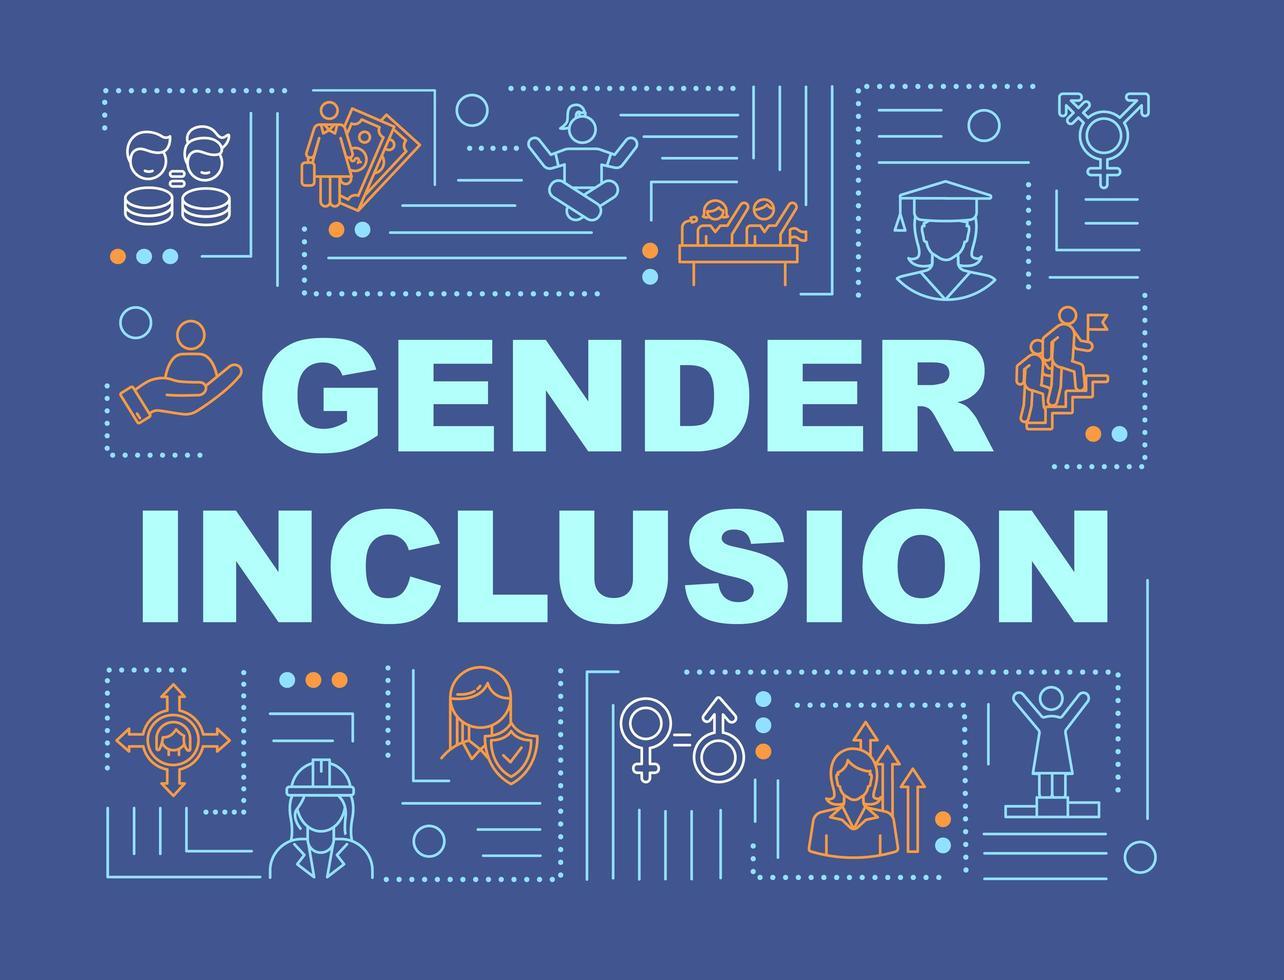 Gender inklusive Gesellschaft Wort Konzepte Banner vektor